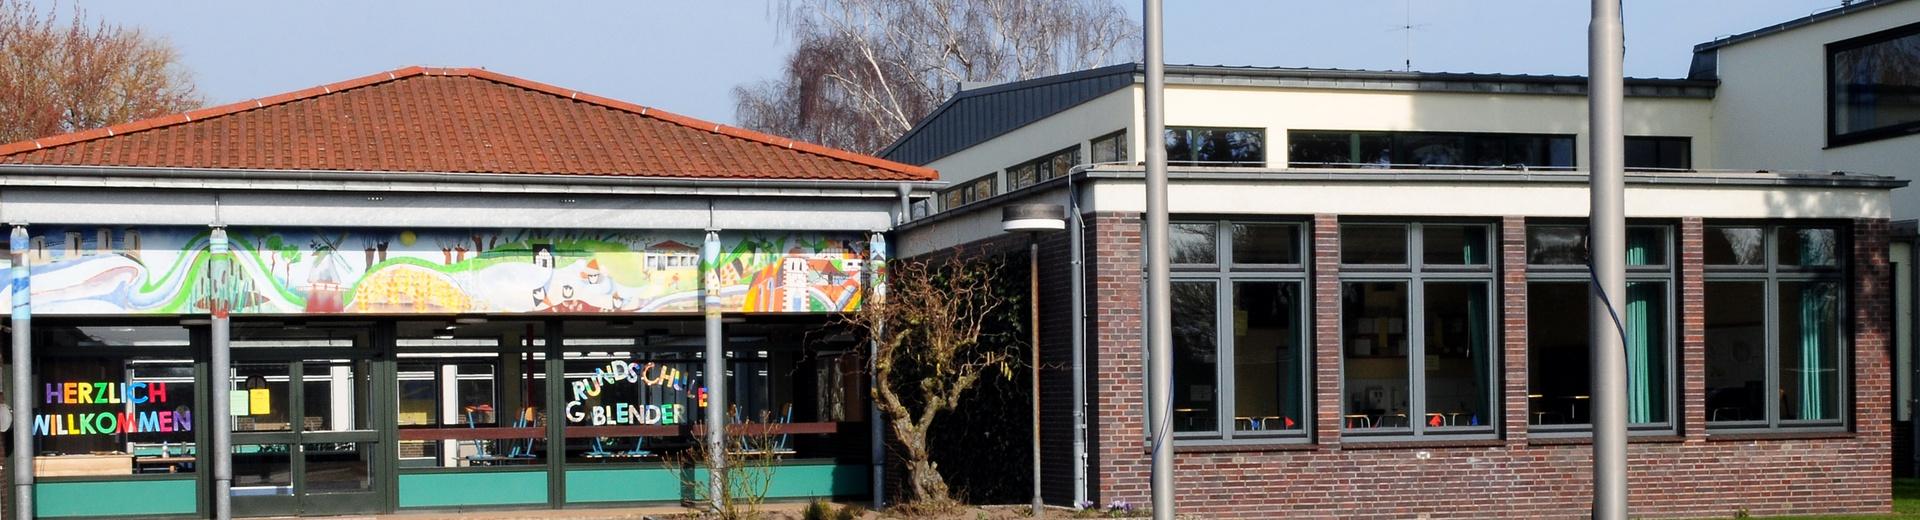 Rathaus_Folgeseite_GS_Blender